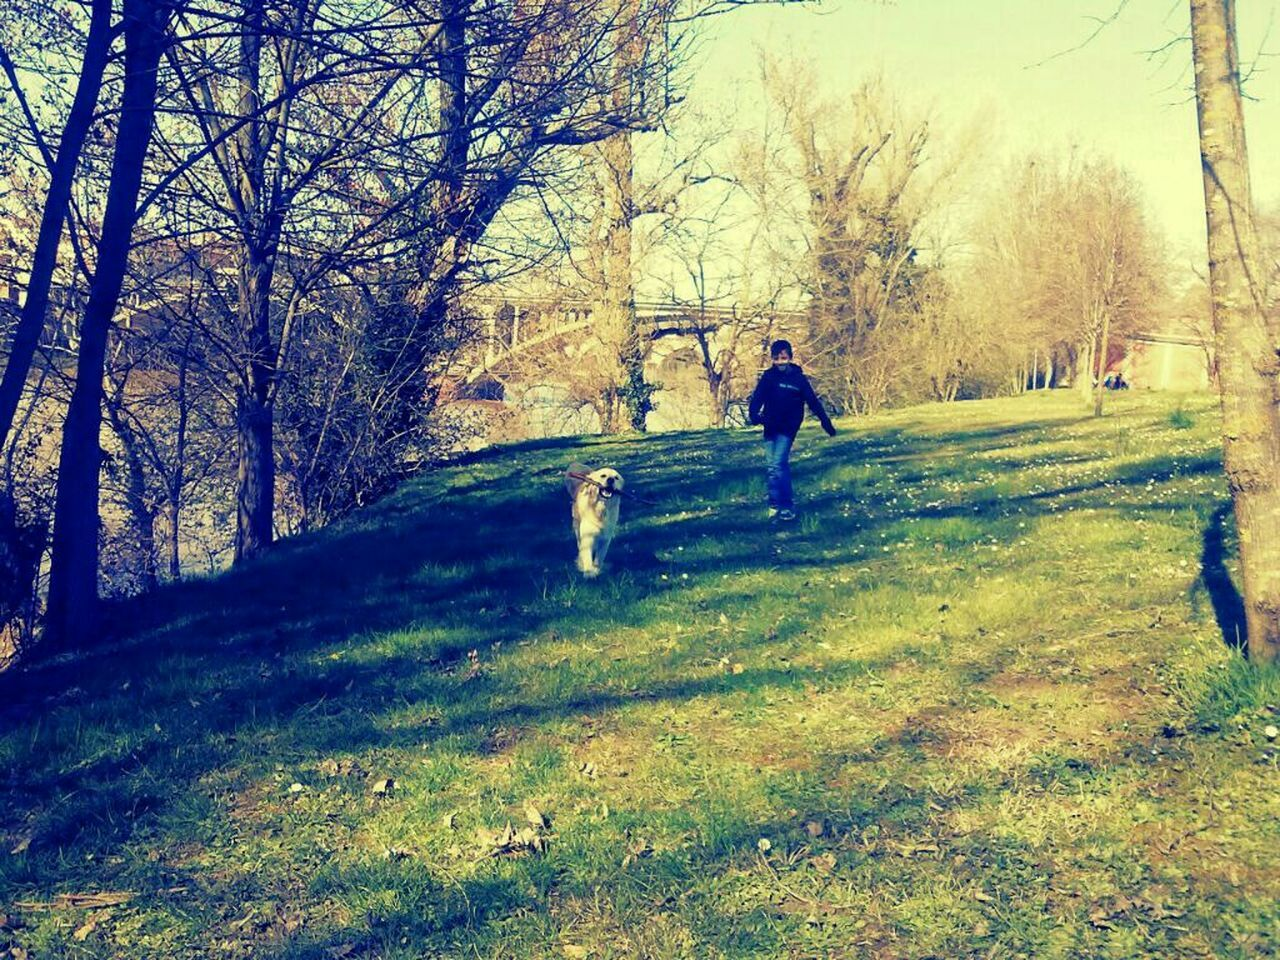 Ilovemydog MySON♥ Playing With The Animals Funnytime